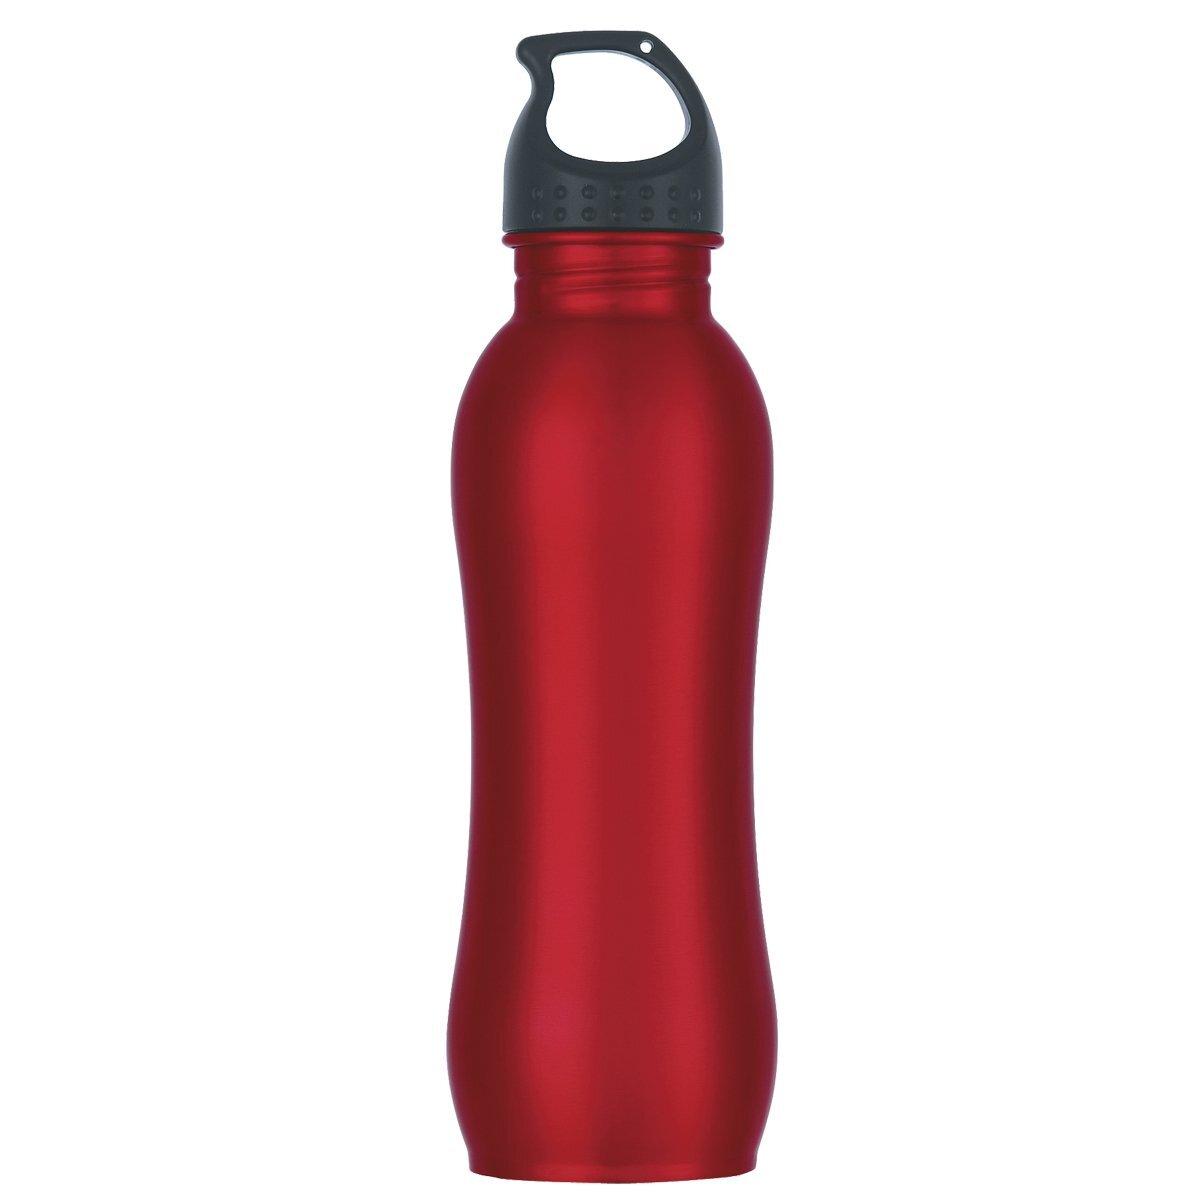 Stainless Steel Grip Bottle, 25oz., BPA Free